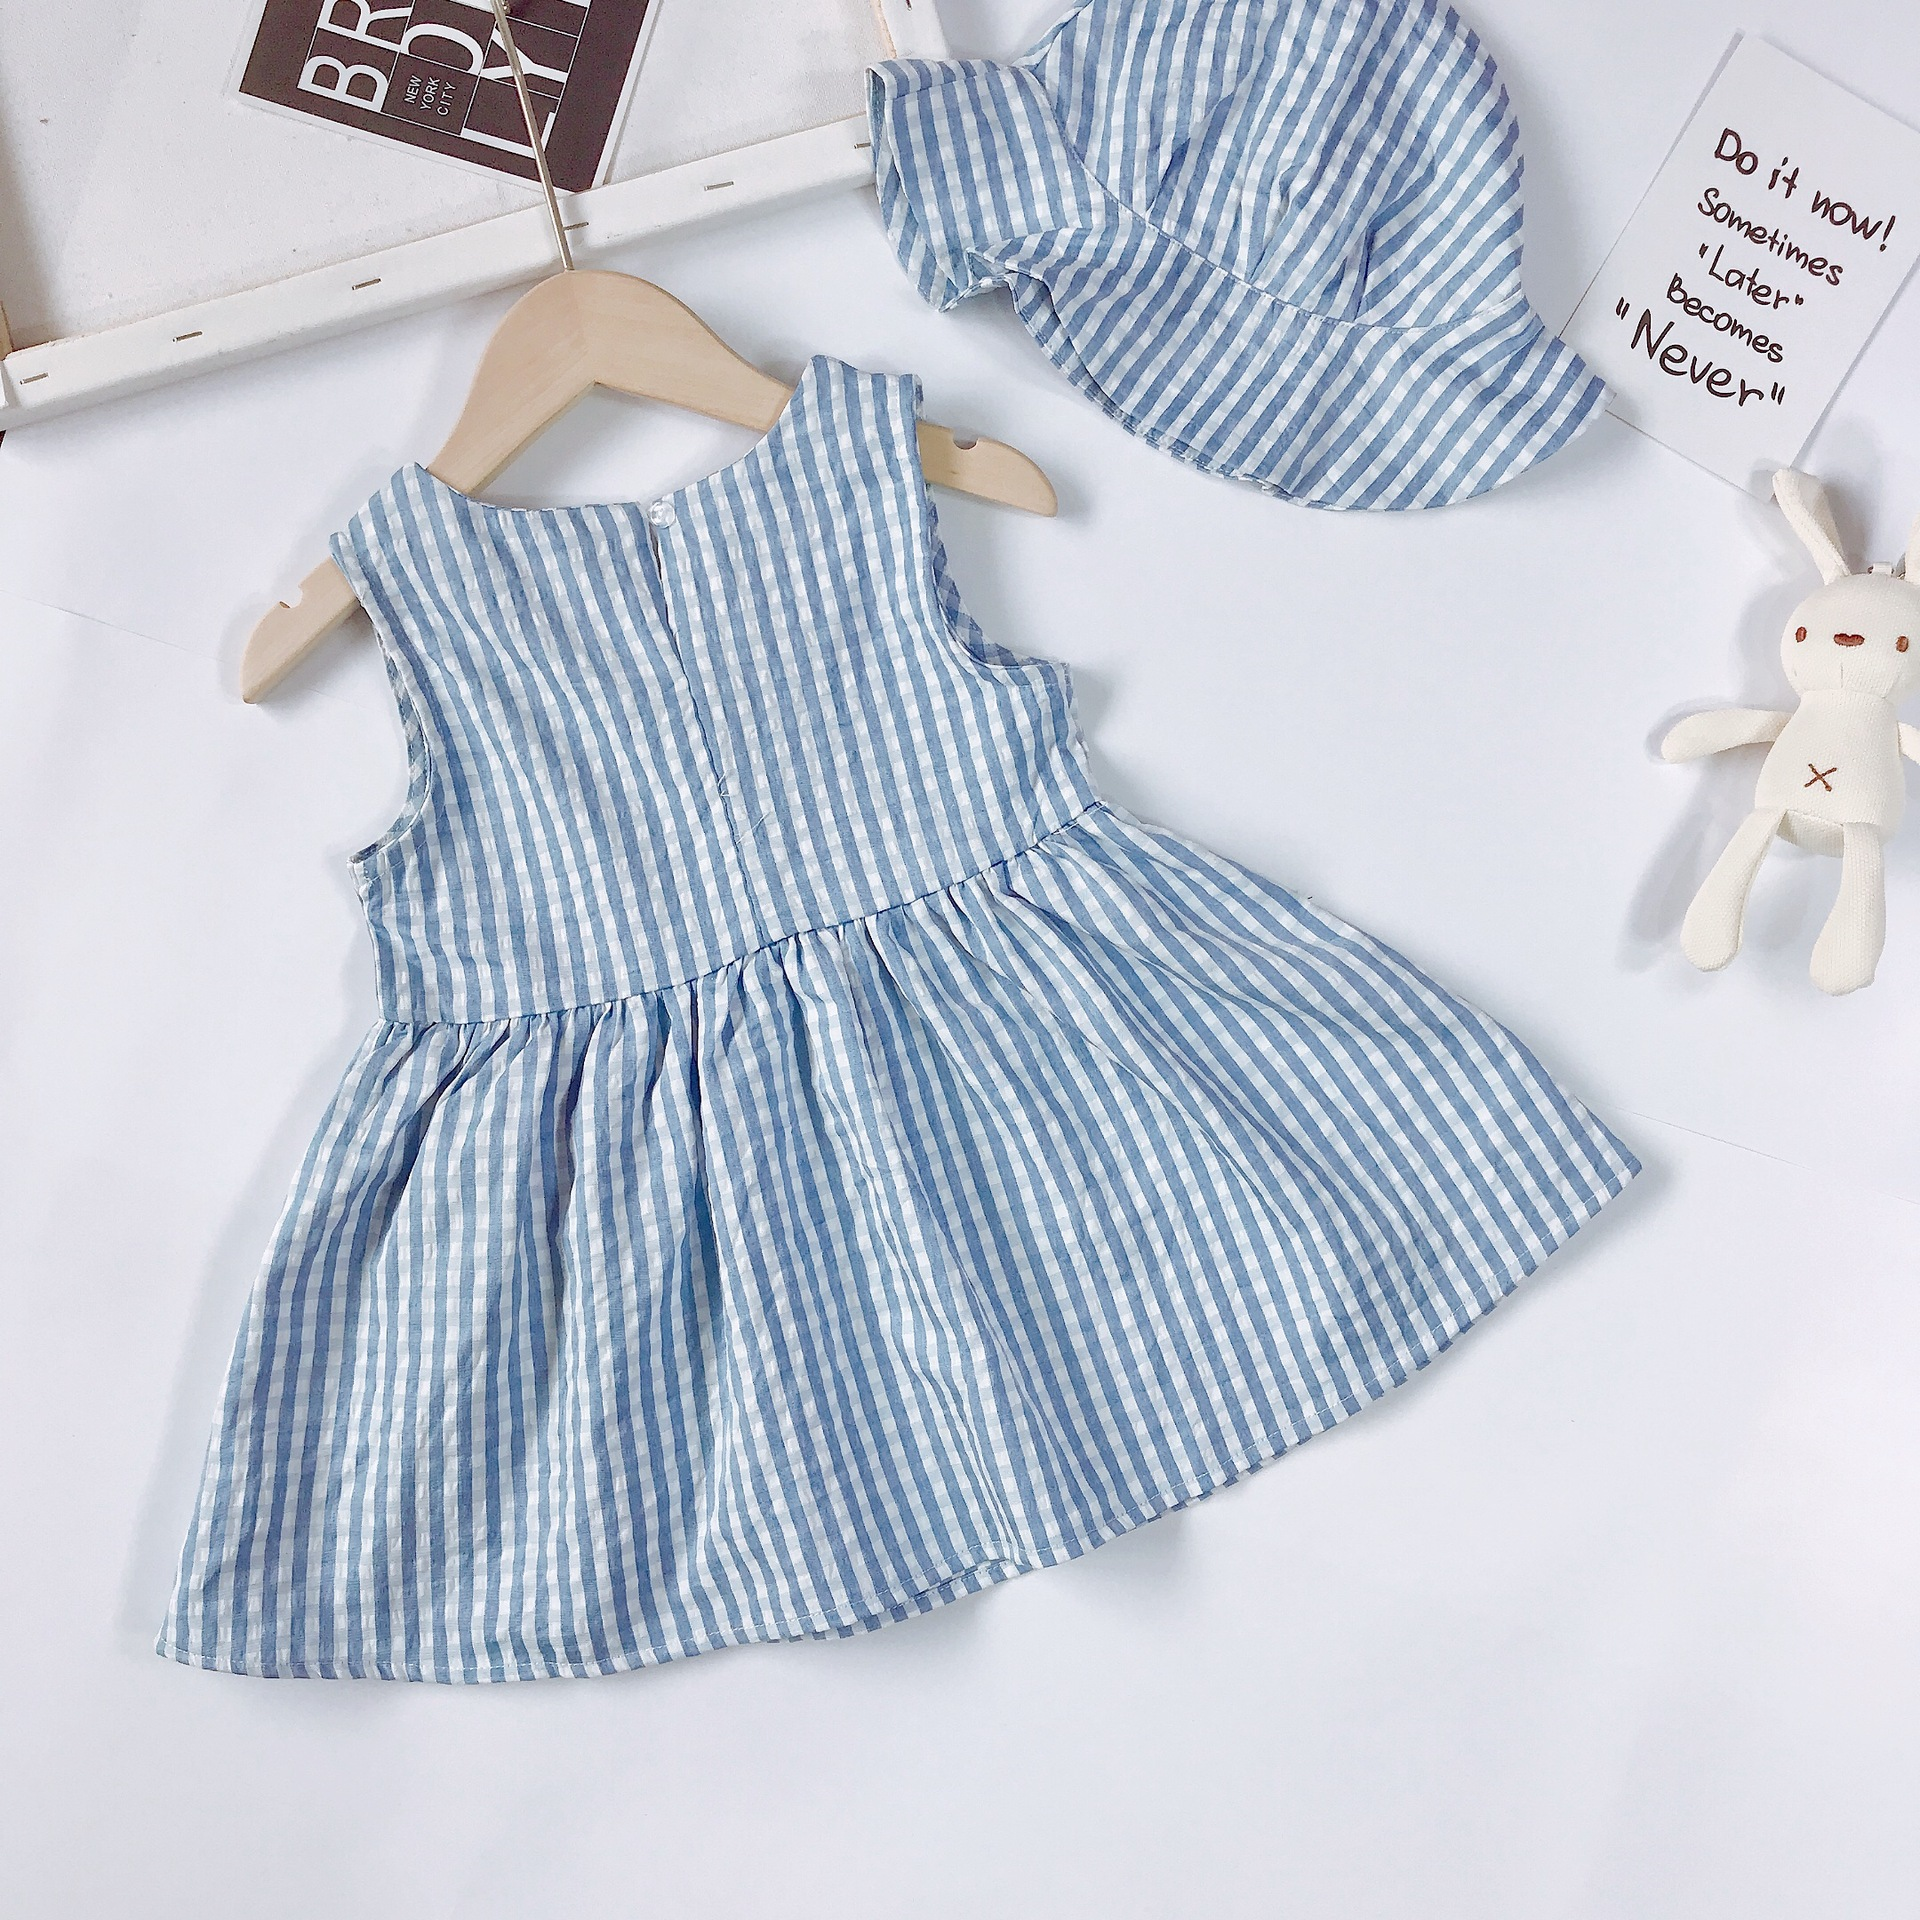 2020 verao criancas conjuntos de roupas 2pcs 04